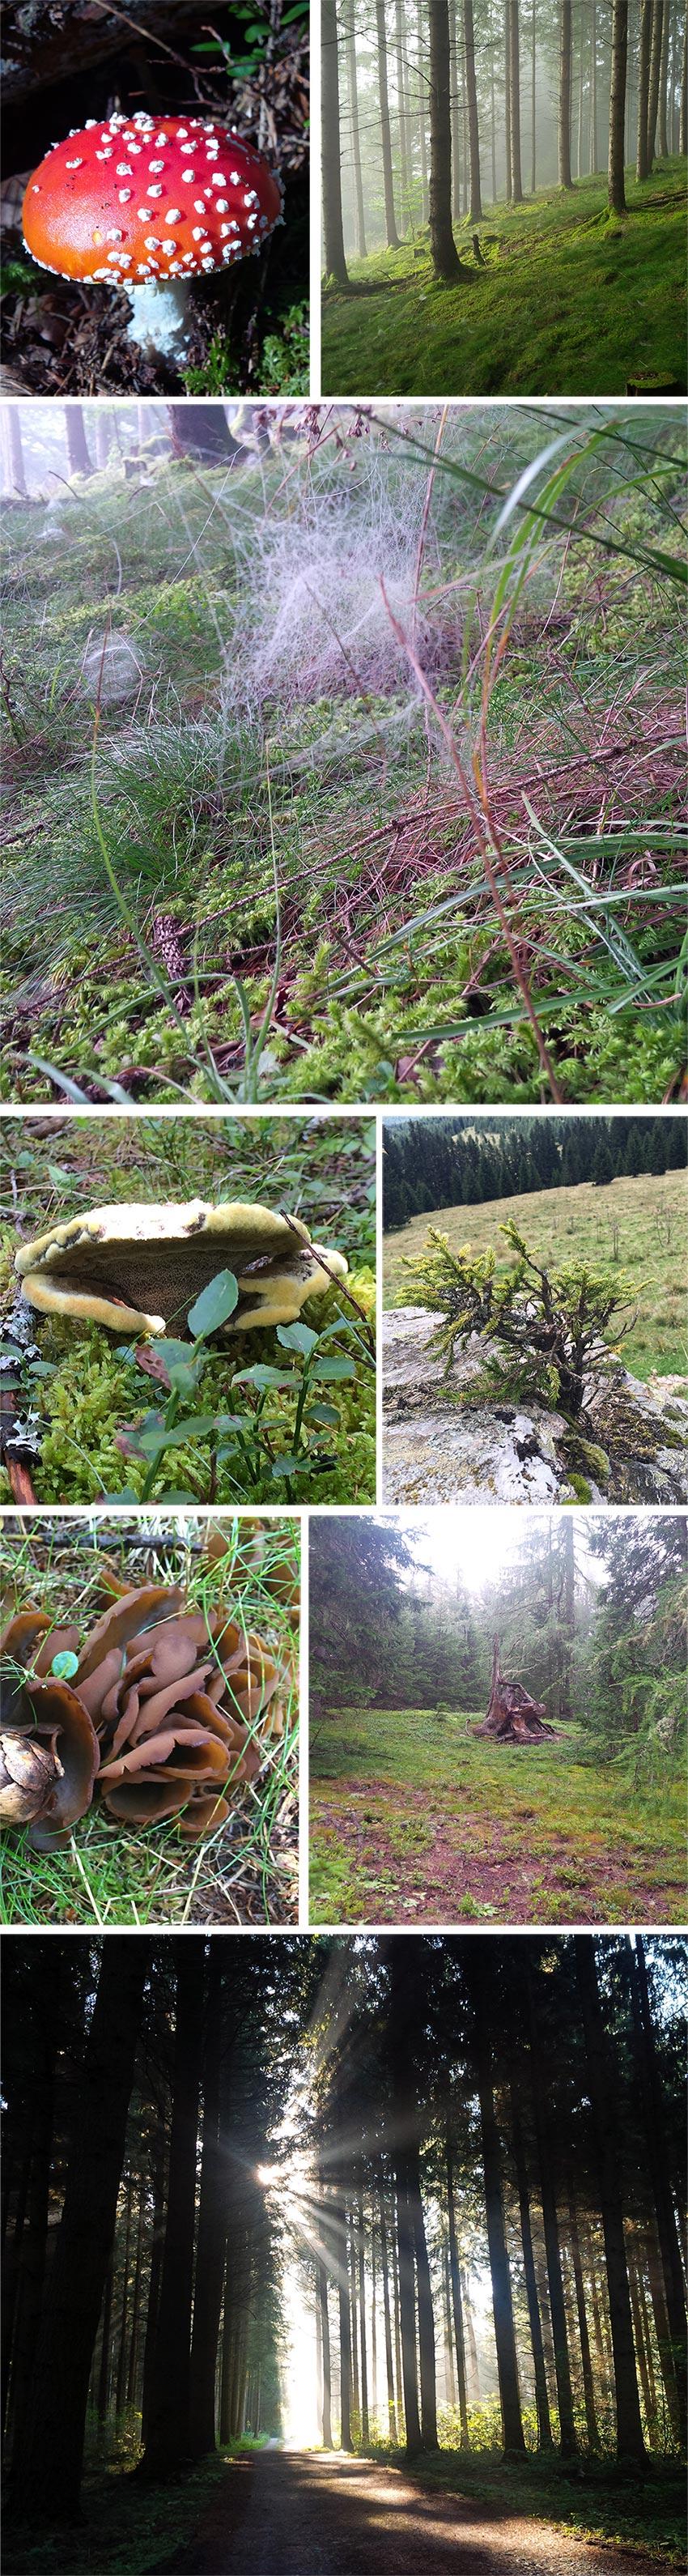 Magischer-Wald59ada65adcbfe